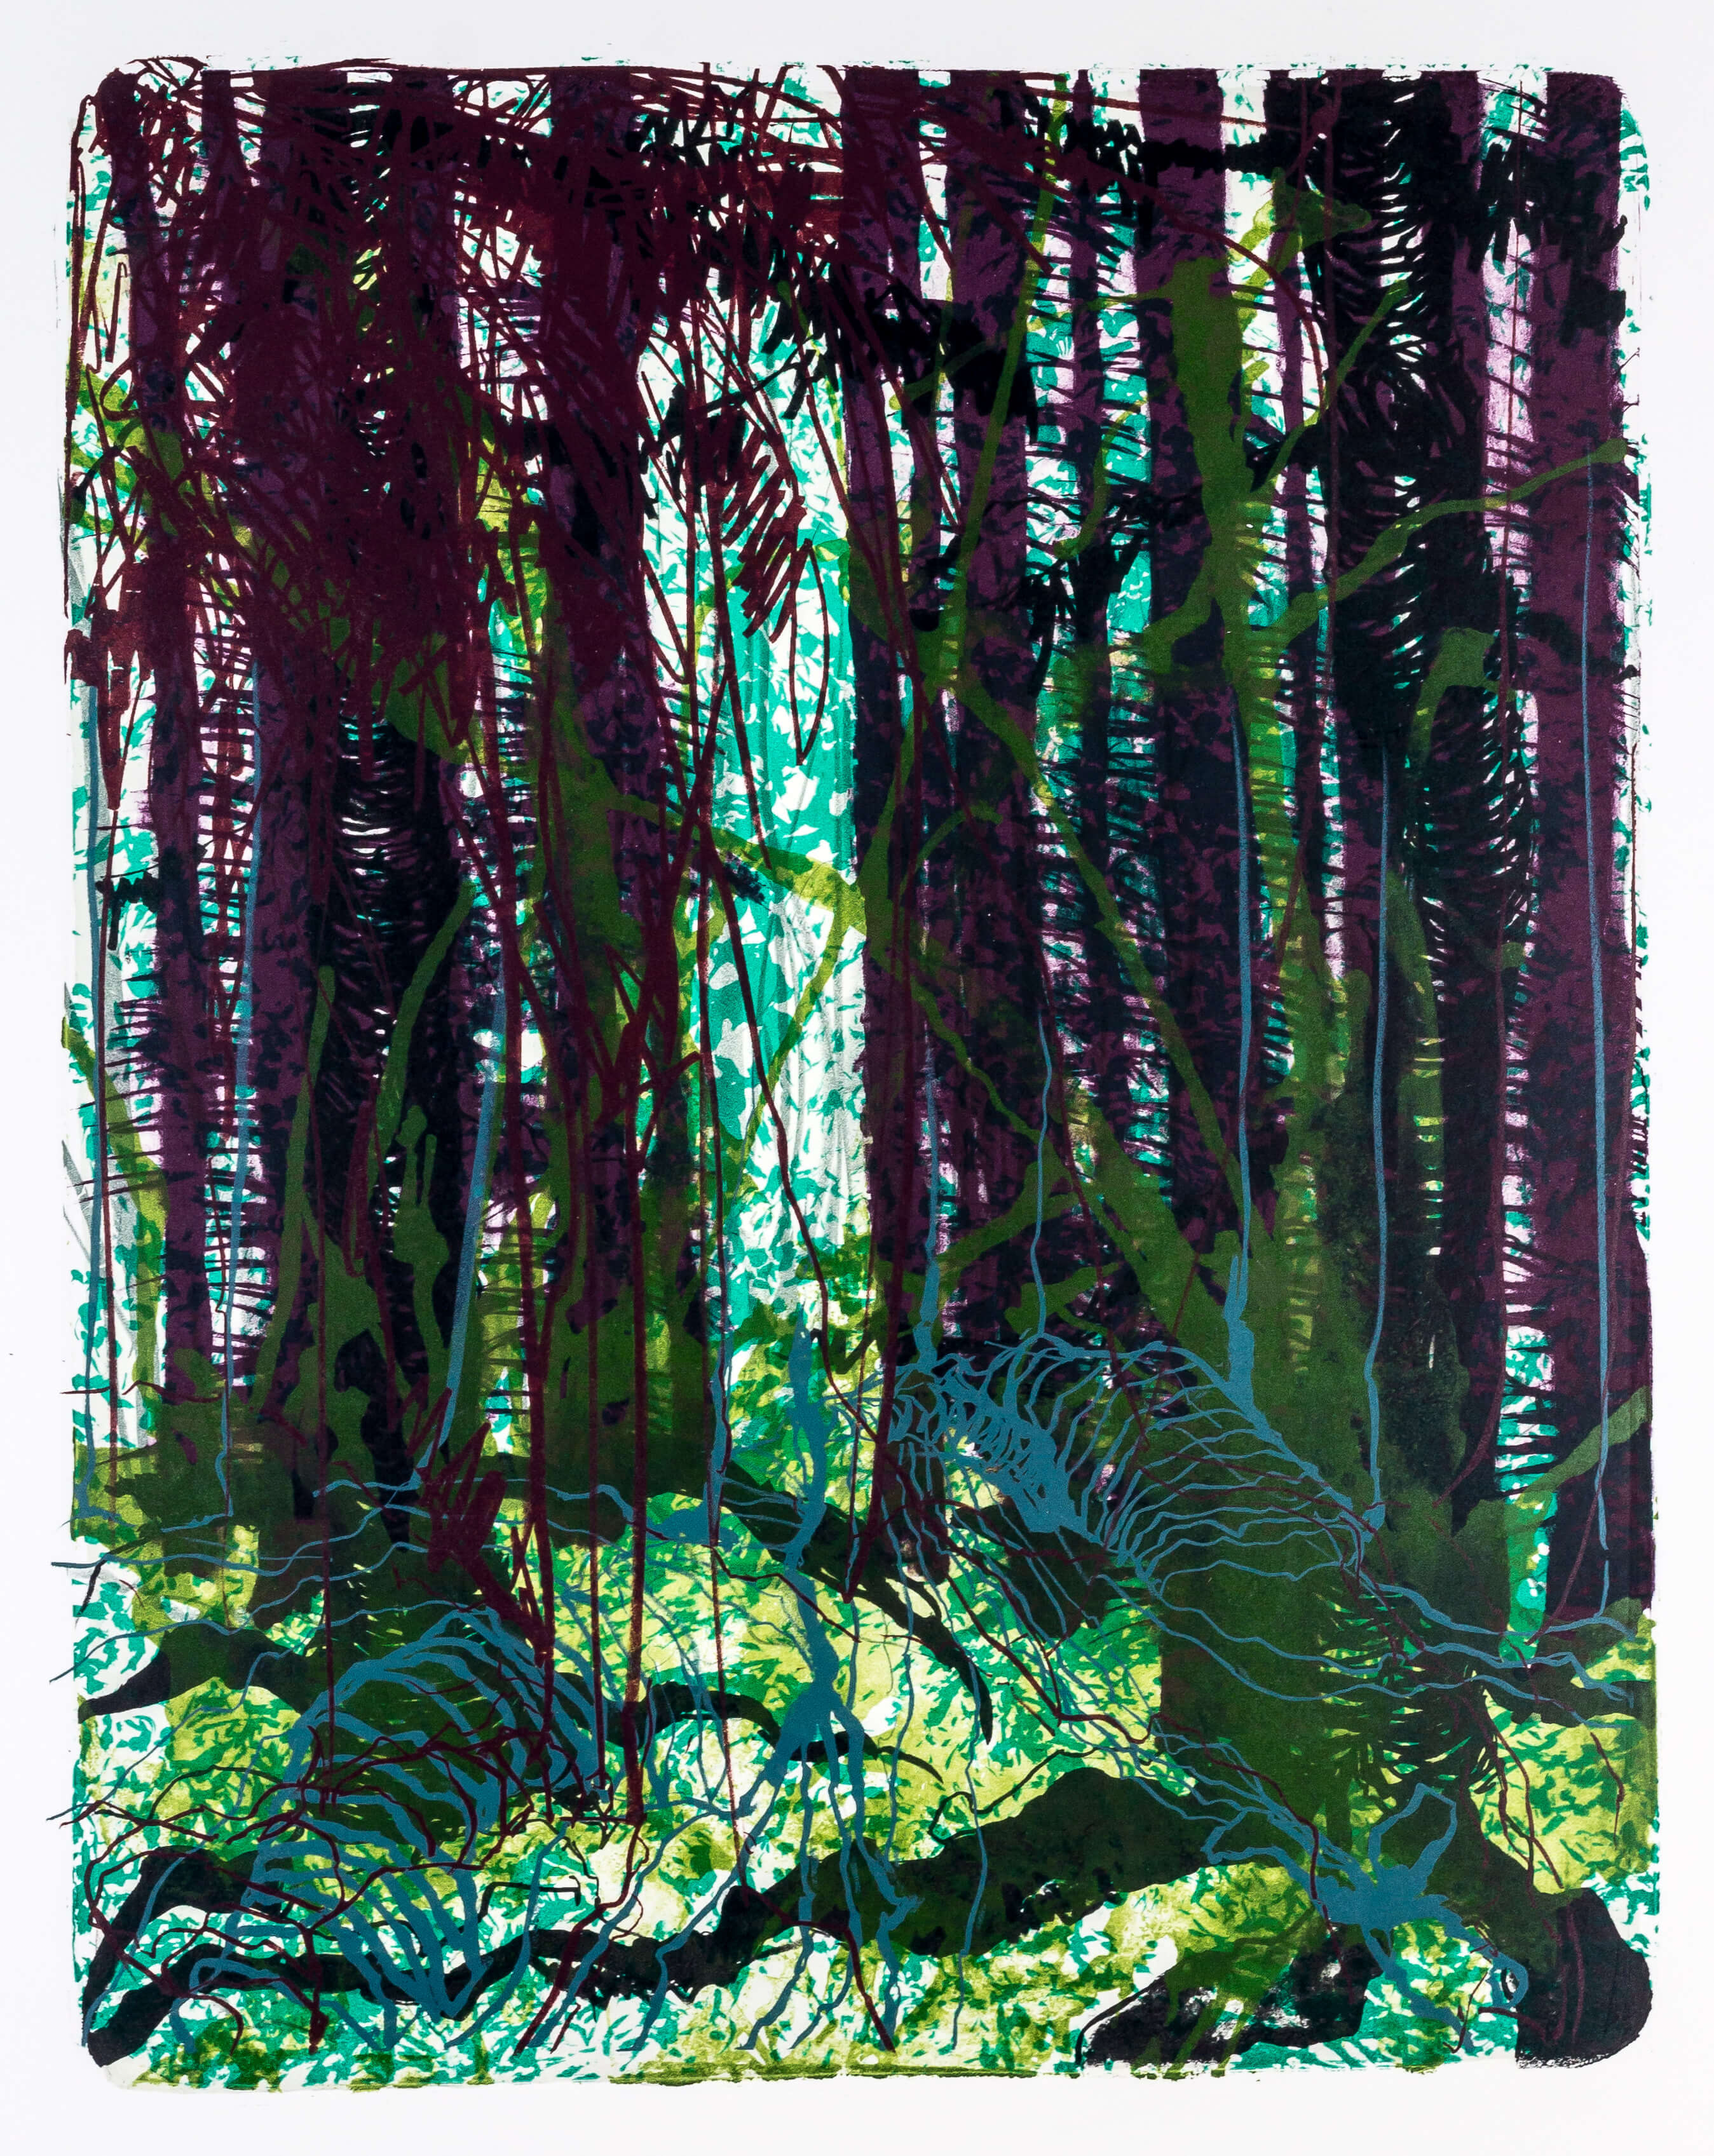 Katharina Albers, Wald X-XIX, 2015, Farblithographie, Unikat, 50×40 cm